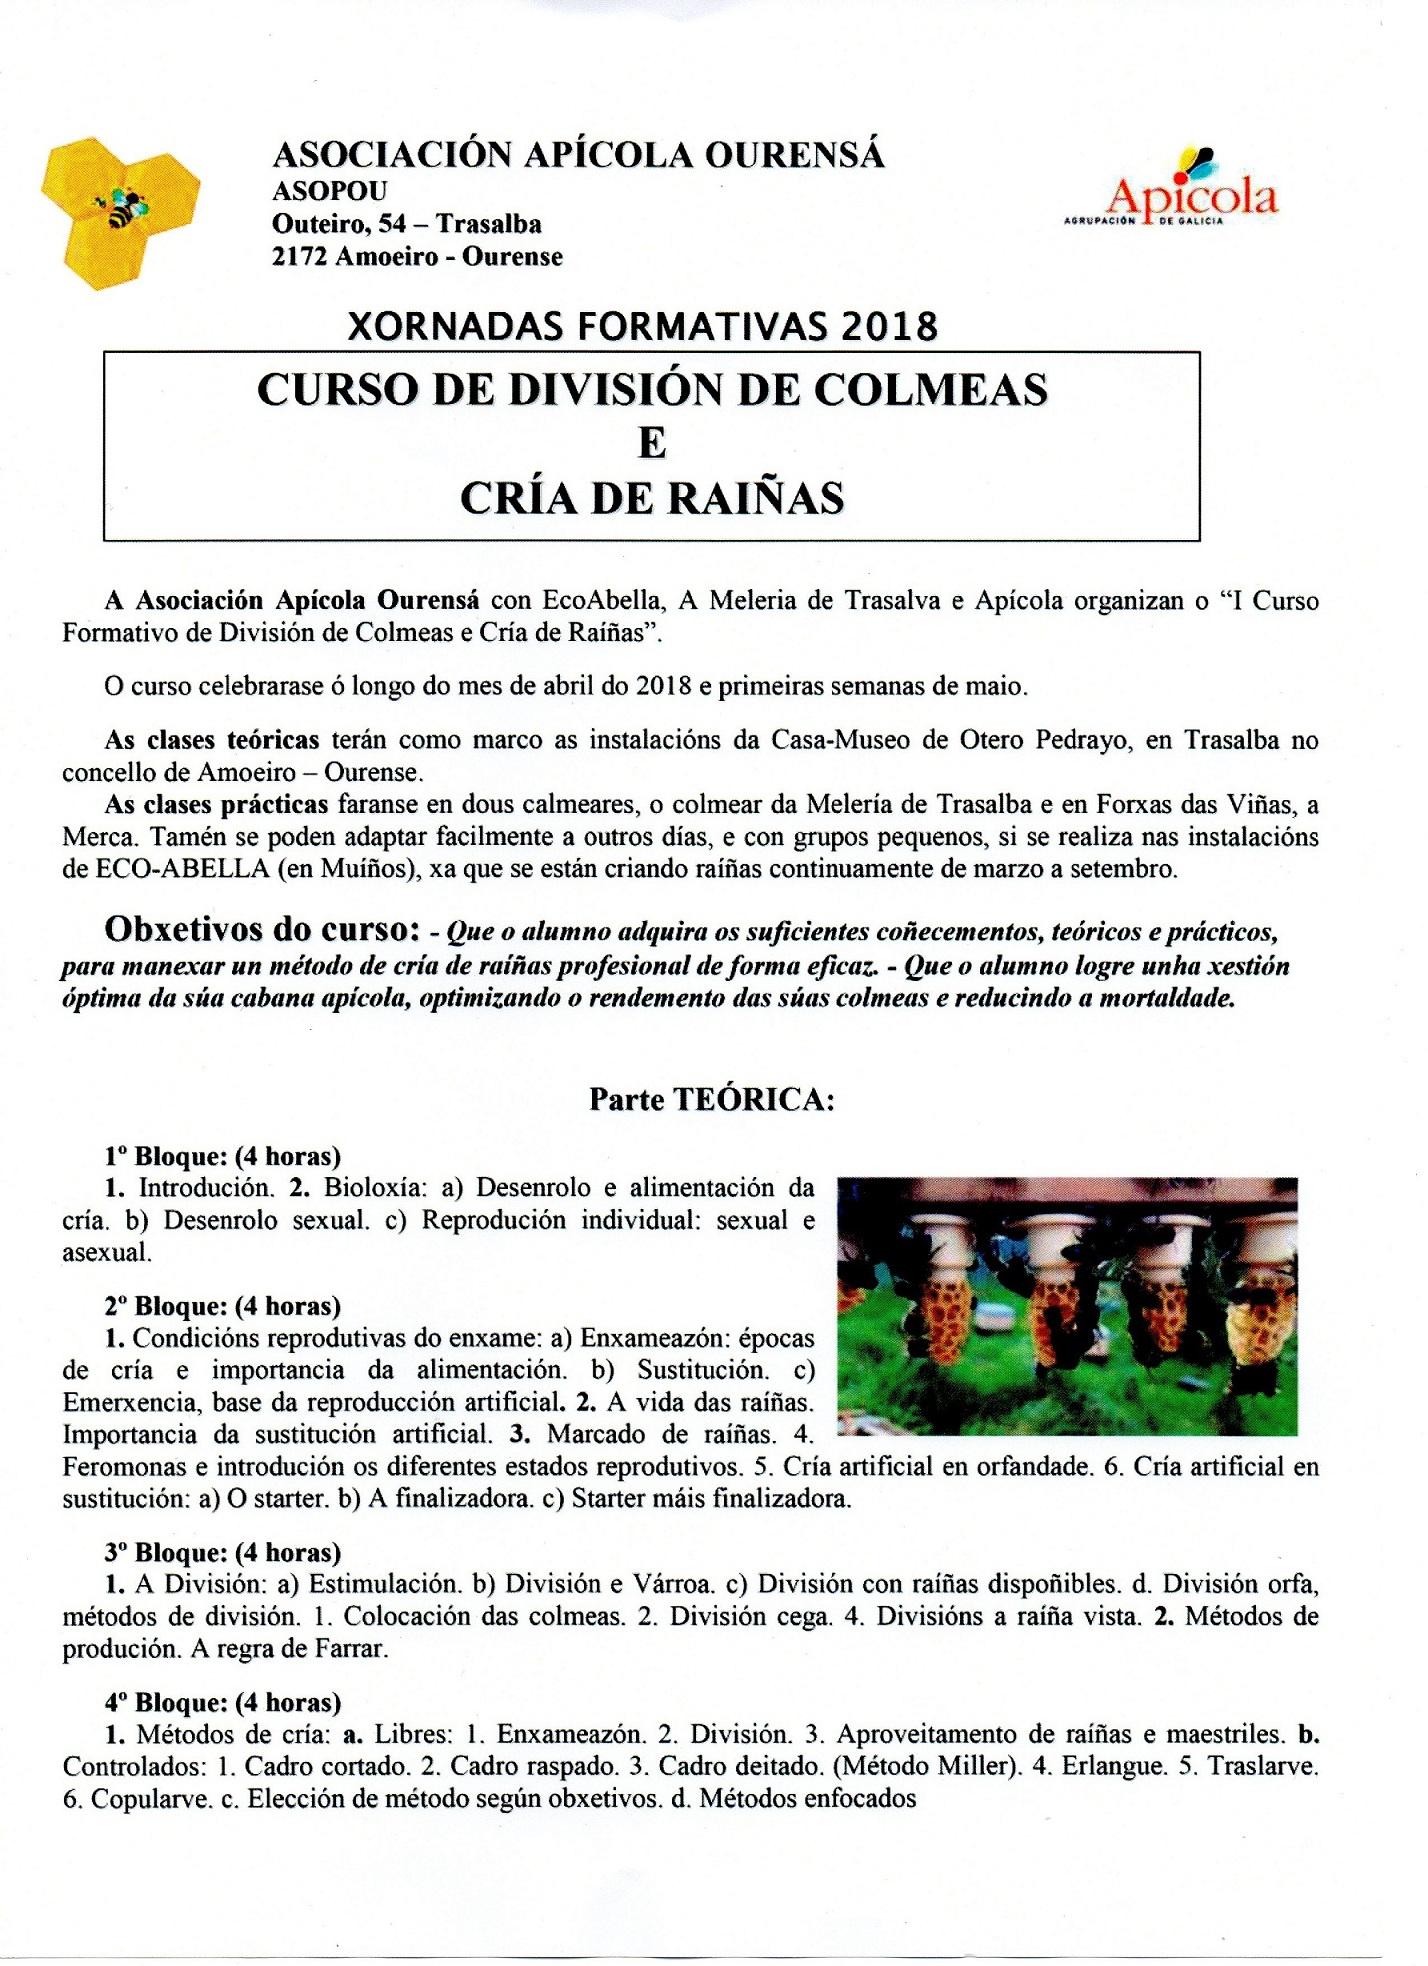 CURSO DIVISIÓN DE COLMENAS Y CRÍA DE REINAS (Amoeiro,  Ourense)